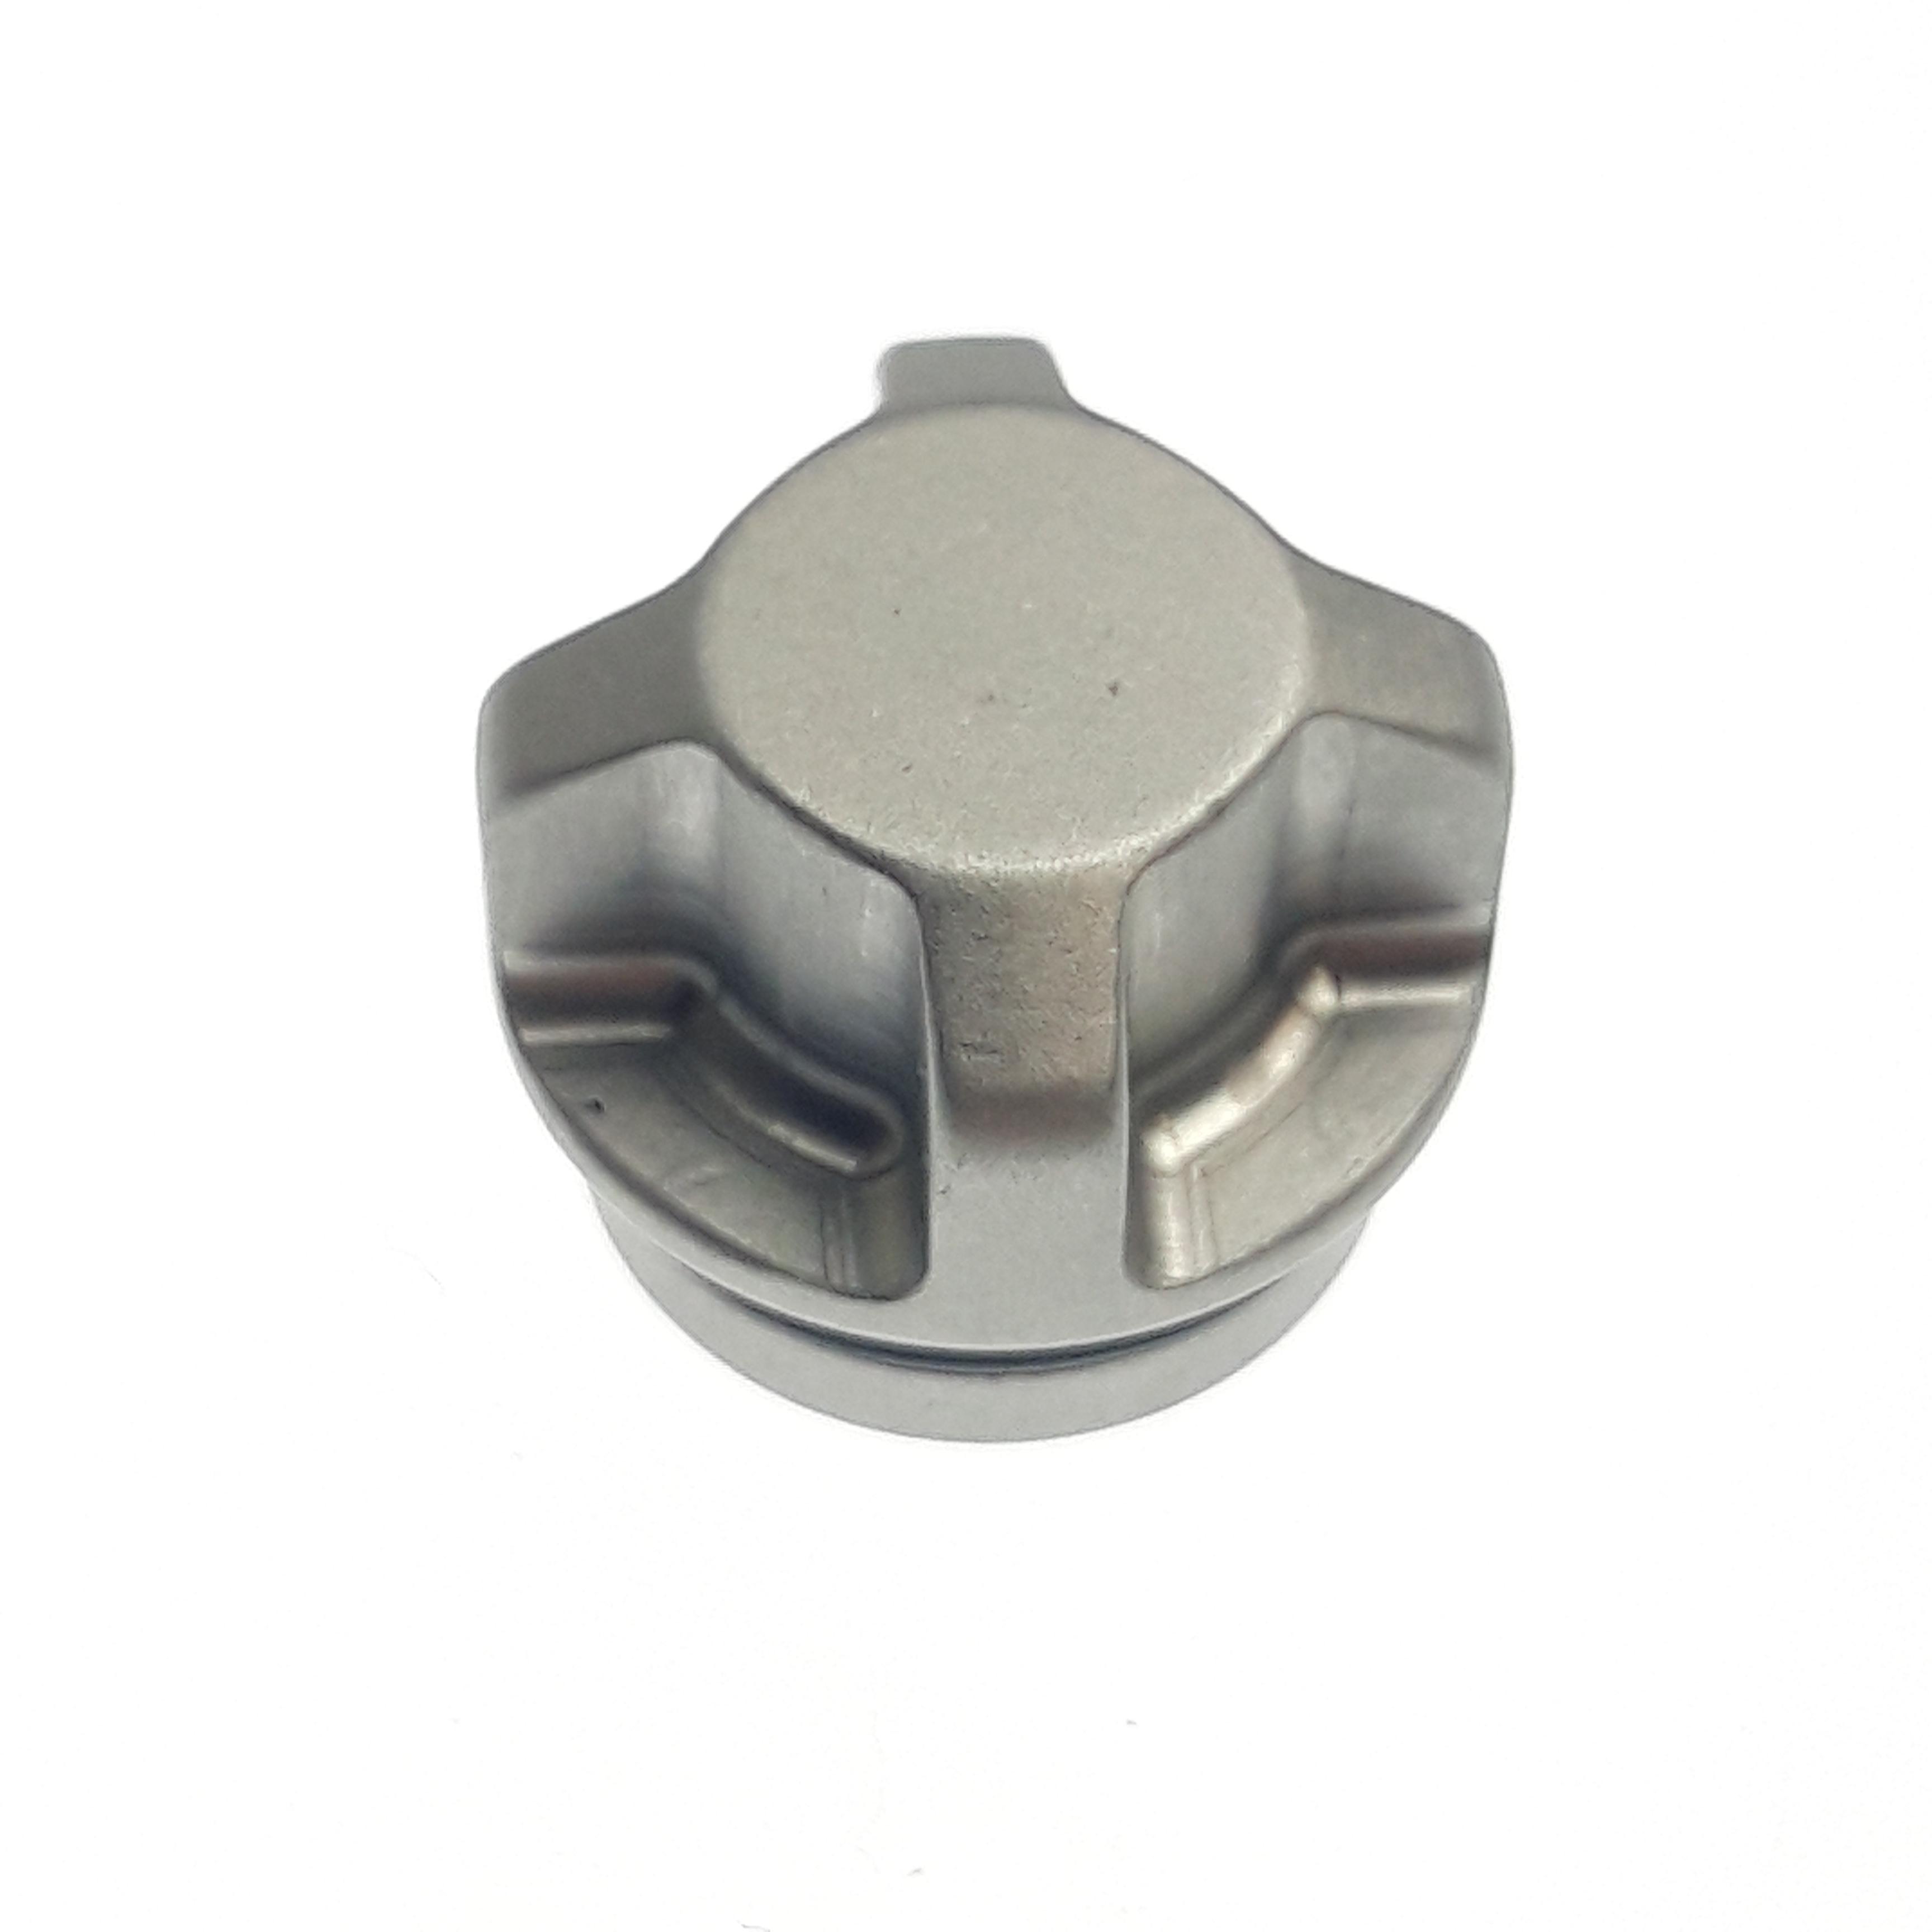 set: Air Valve Assembly: Schrader Topcap [.678 OD X 0.530 TLG] Aluminum, Clear Ano II